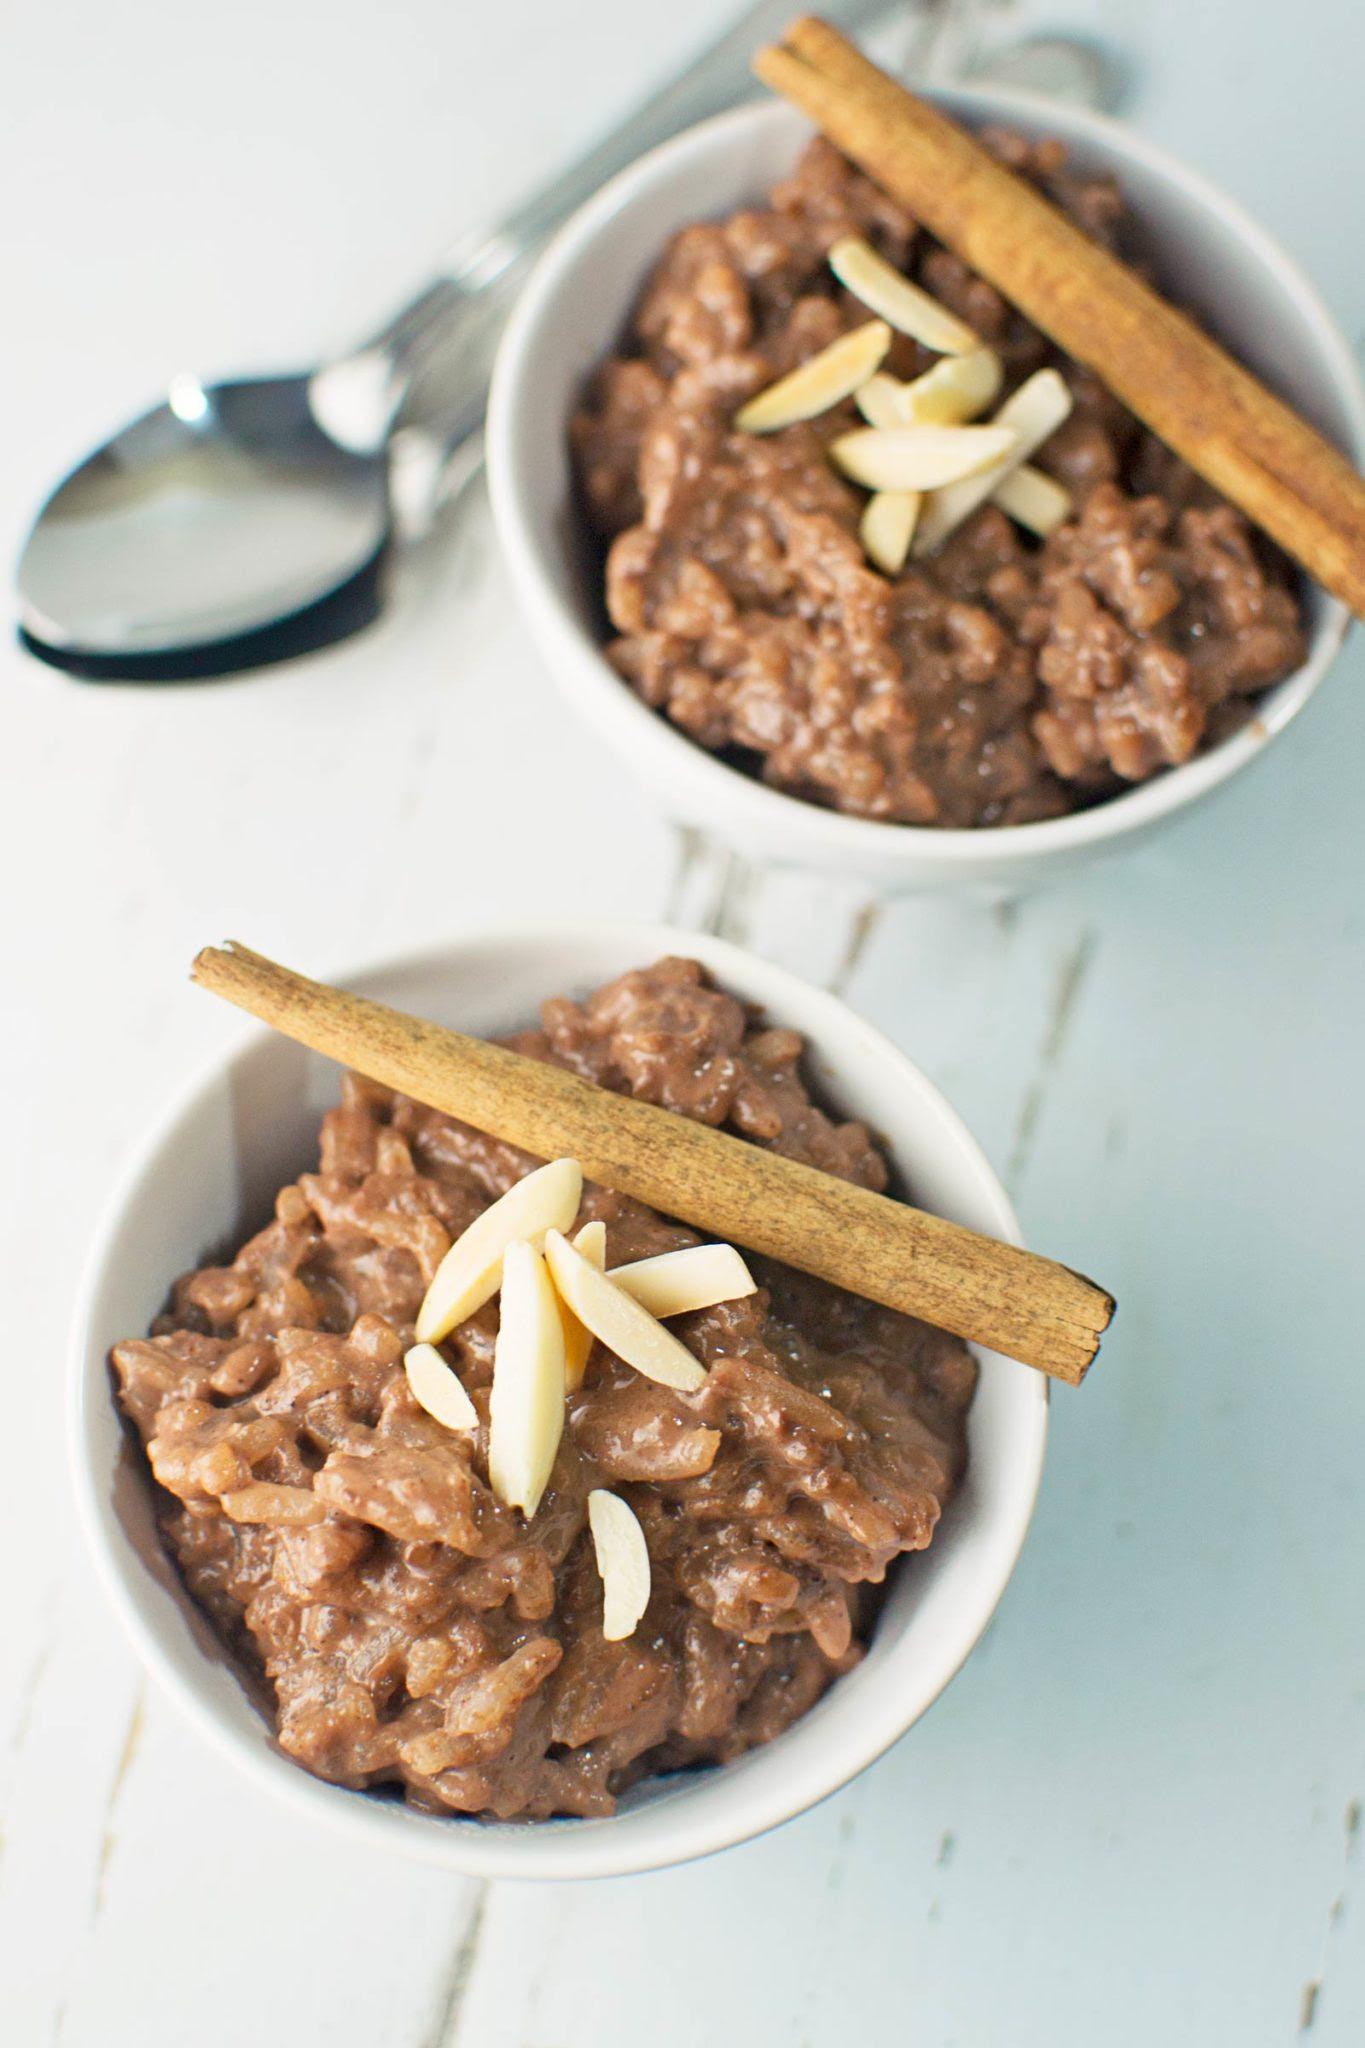 Chocolate Cinnamon Rice Pudding - Little Figgy Food